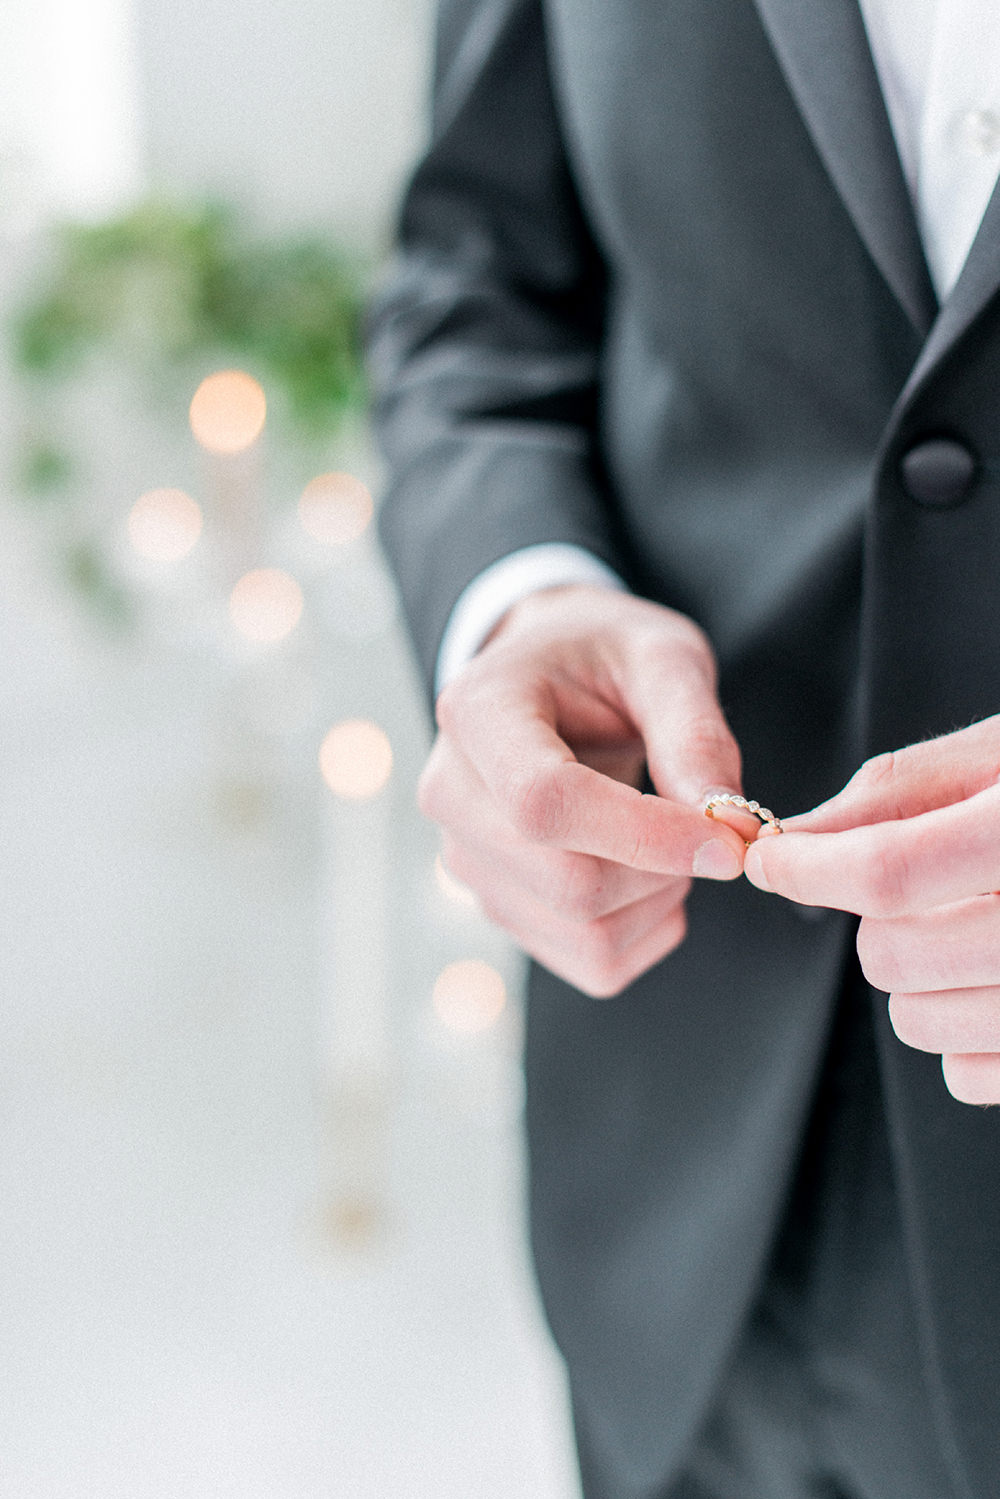 wedding rings - photo by Laura Kelly Photography http://ruffledblog.com/minimalist-monochrome-european-wedding-inspiration